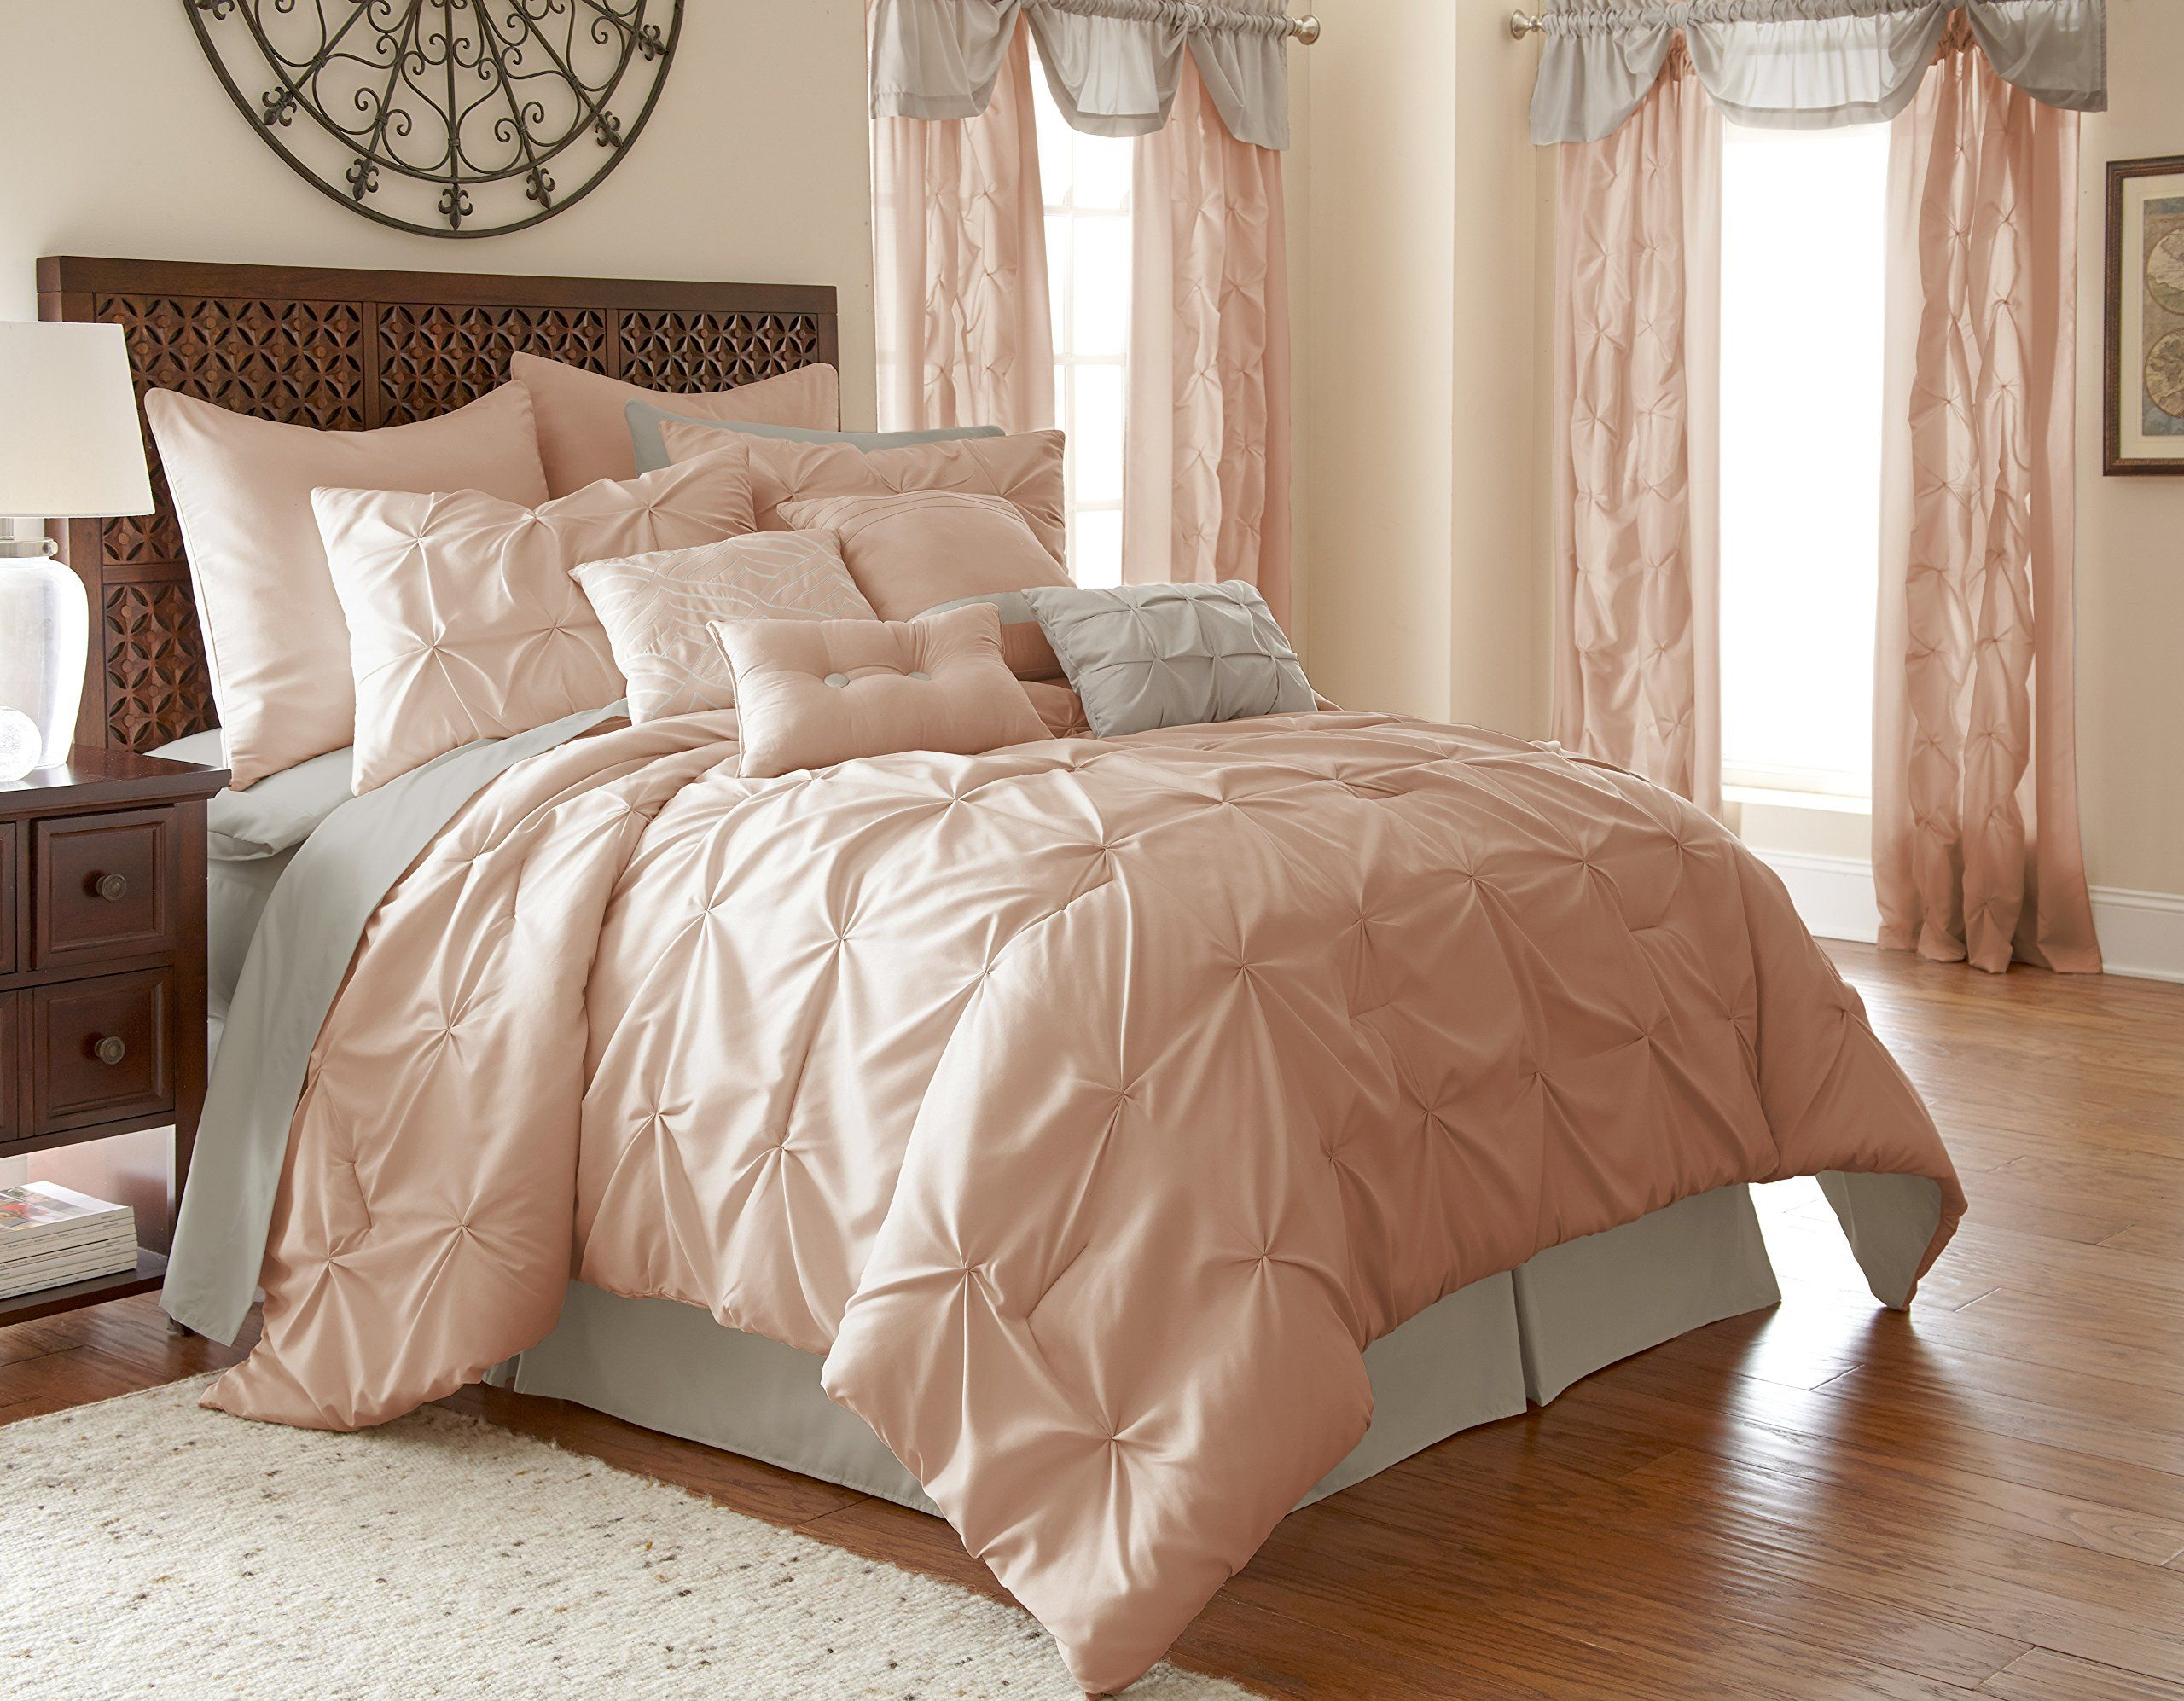 Amrapur Elb Piece Ella Blush Comforter Set Queen Bedding Jpg 2560x1994 Kim  Kardashian Bed Comforter